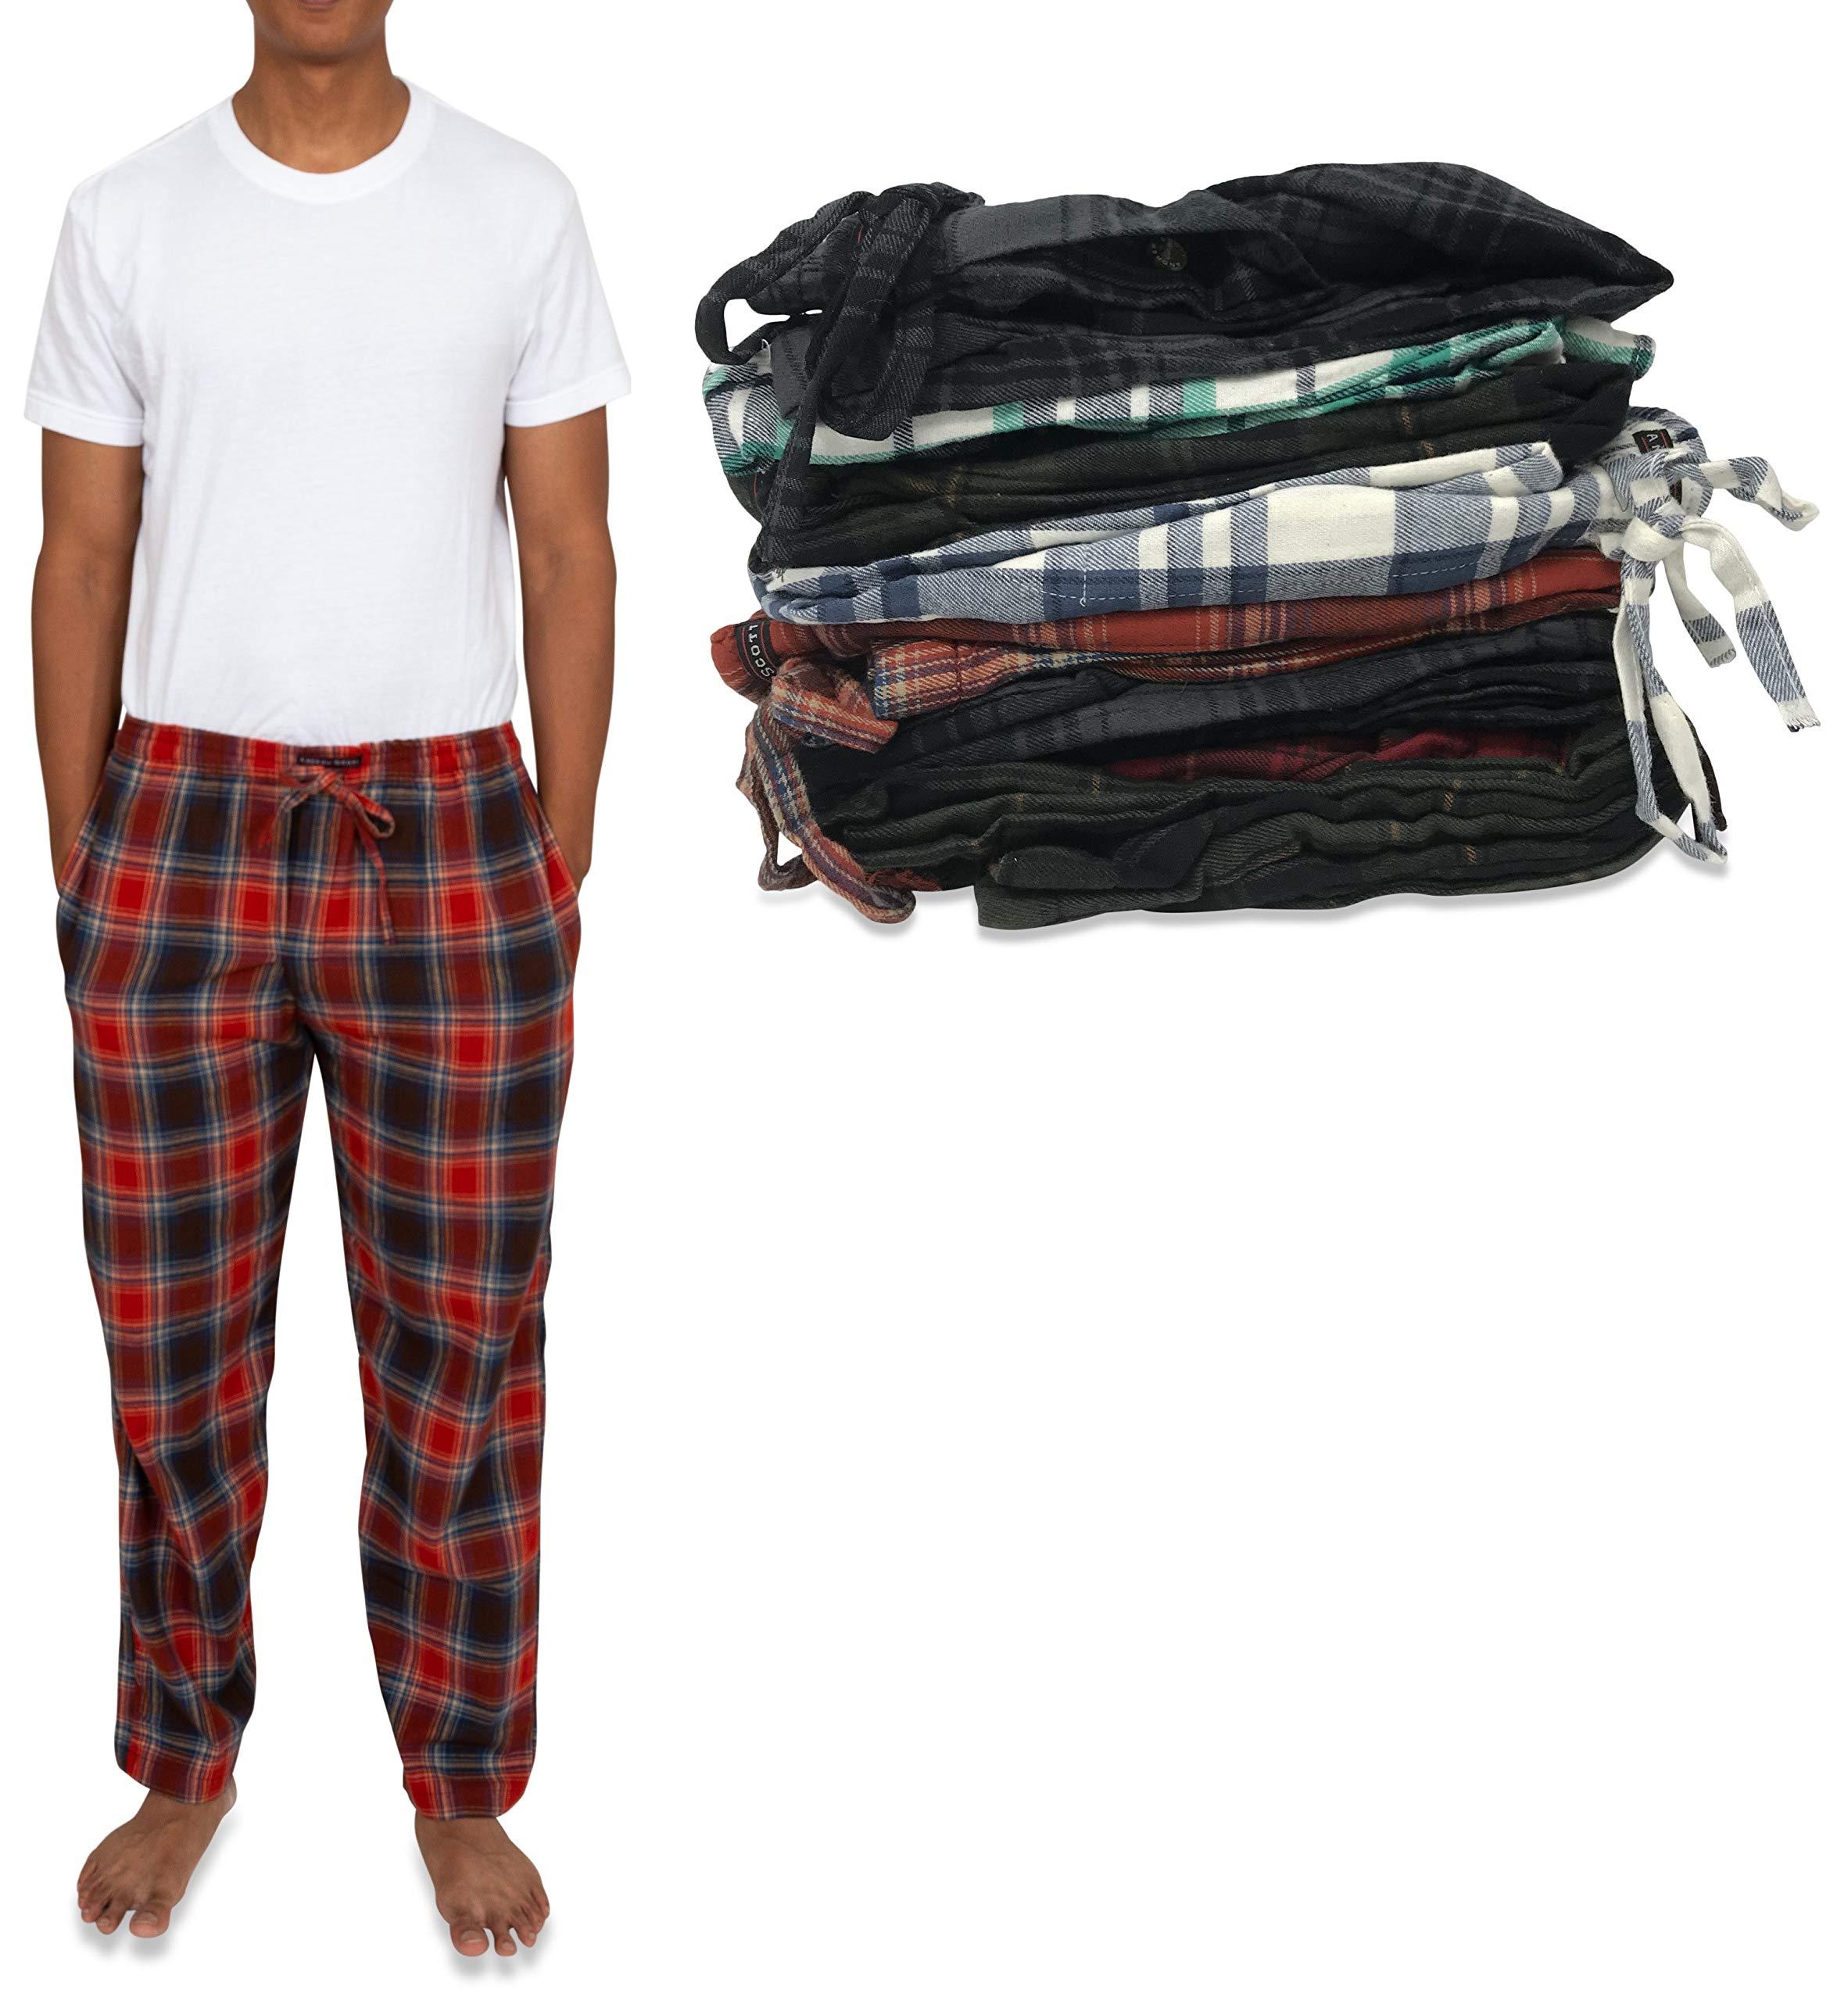 Andrew Scott 男式 4 件装 * 纯棉法兰绒睡裤 - 休闲裤